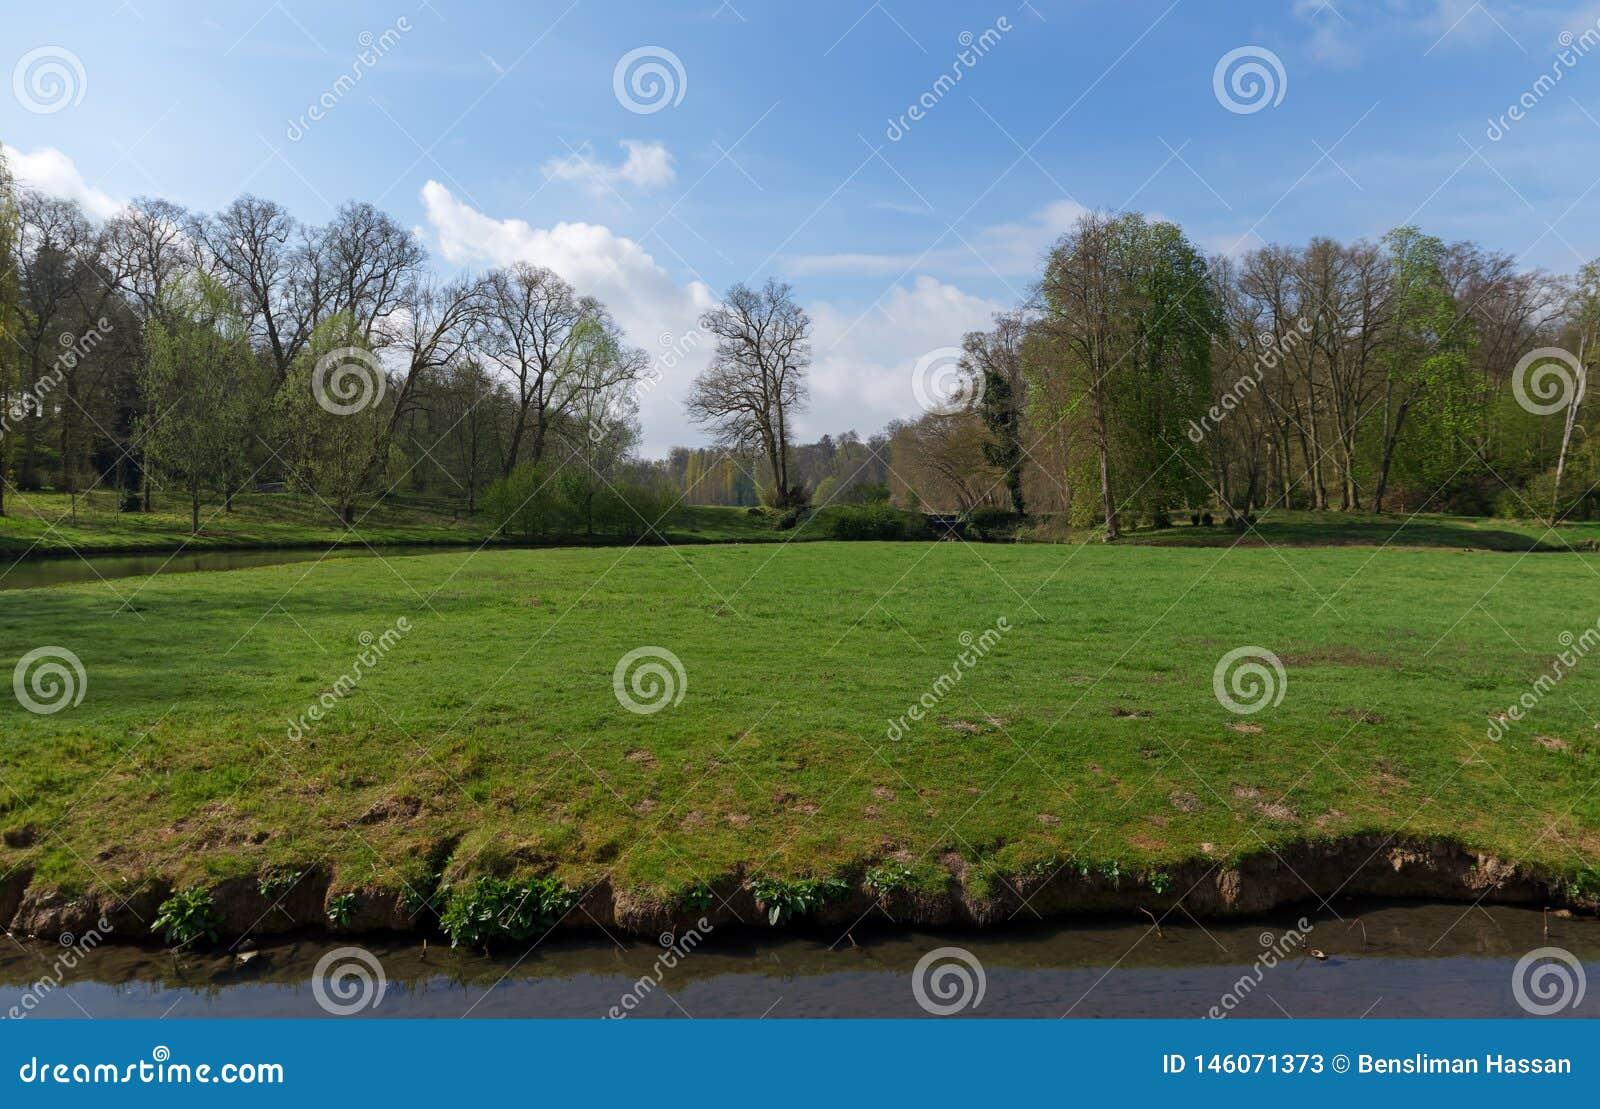 Park Of Ermenonville Village In Picardy Region Stock Image Image Of Tourism Landscape 146071373